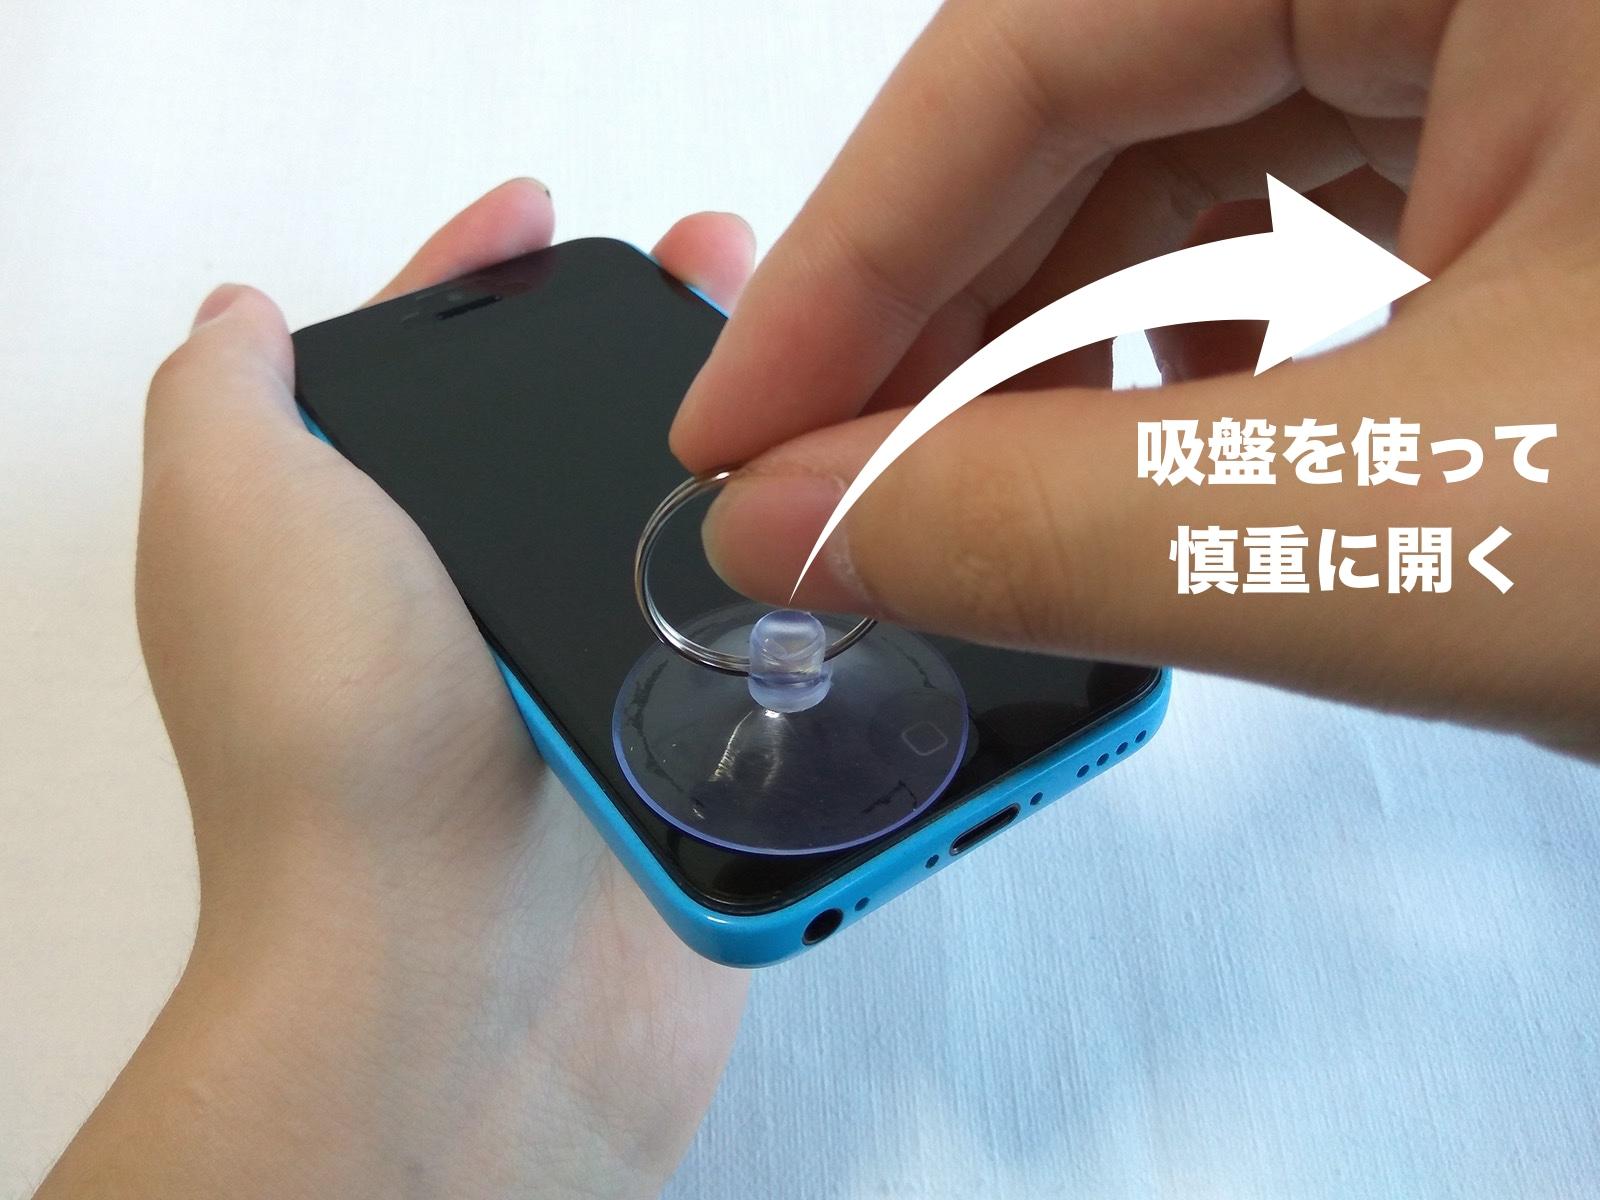 iPhone 5c バッテリー交換 吸盤で持ち上げる